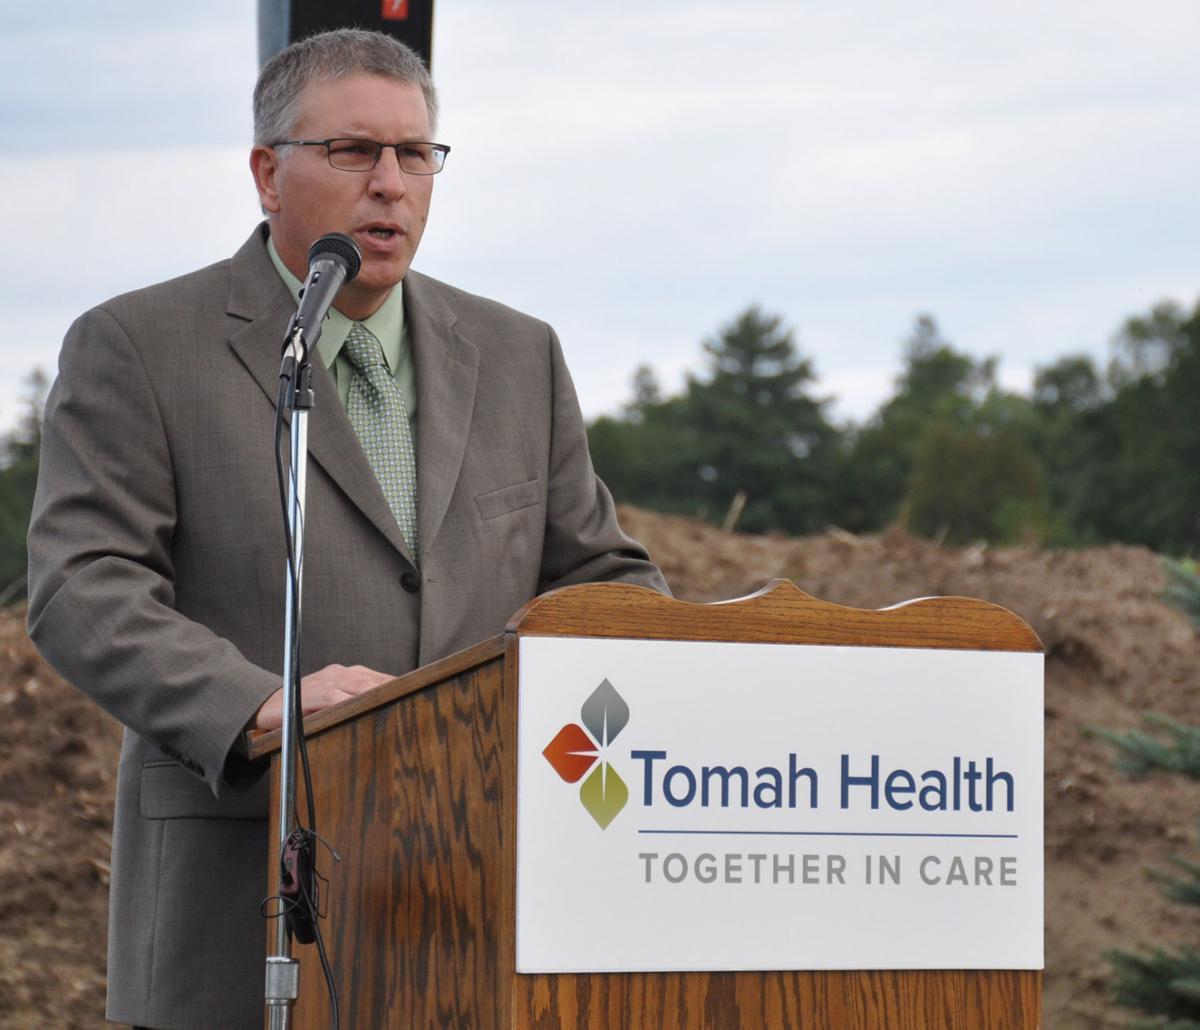 Tomah Health